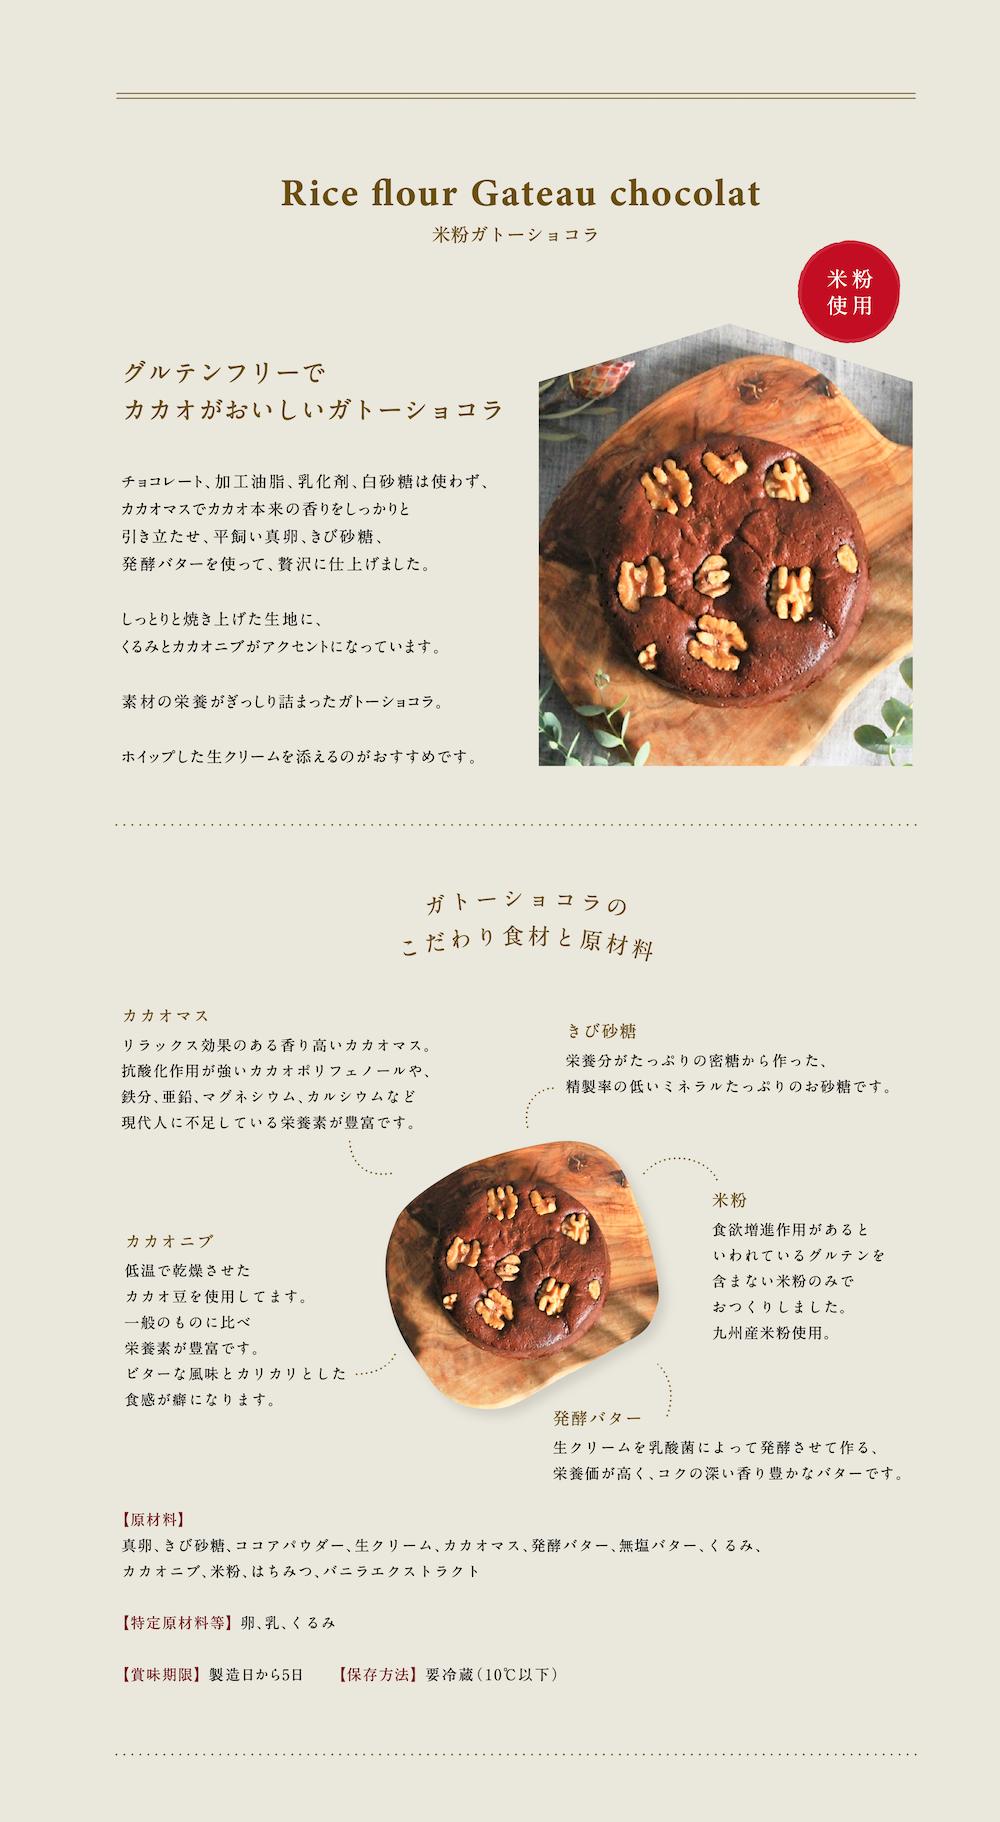 Rice flour Gateau chocolat